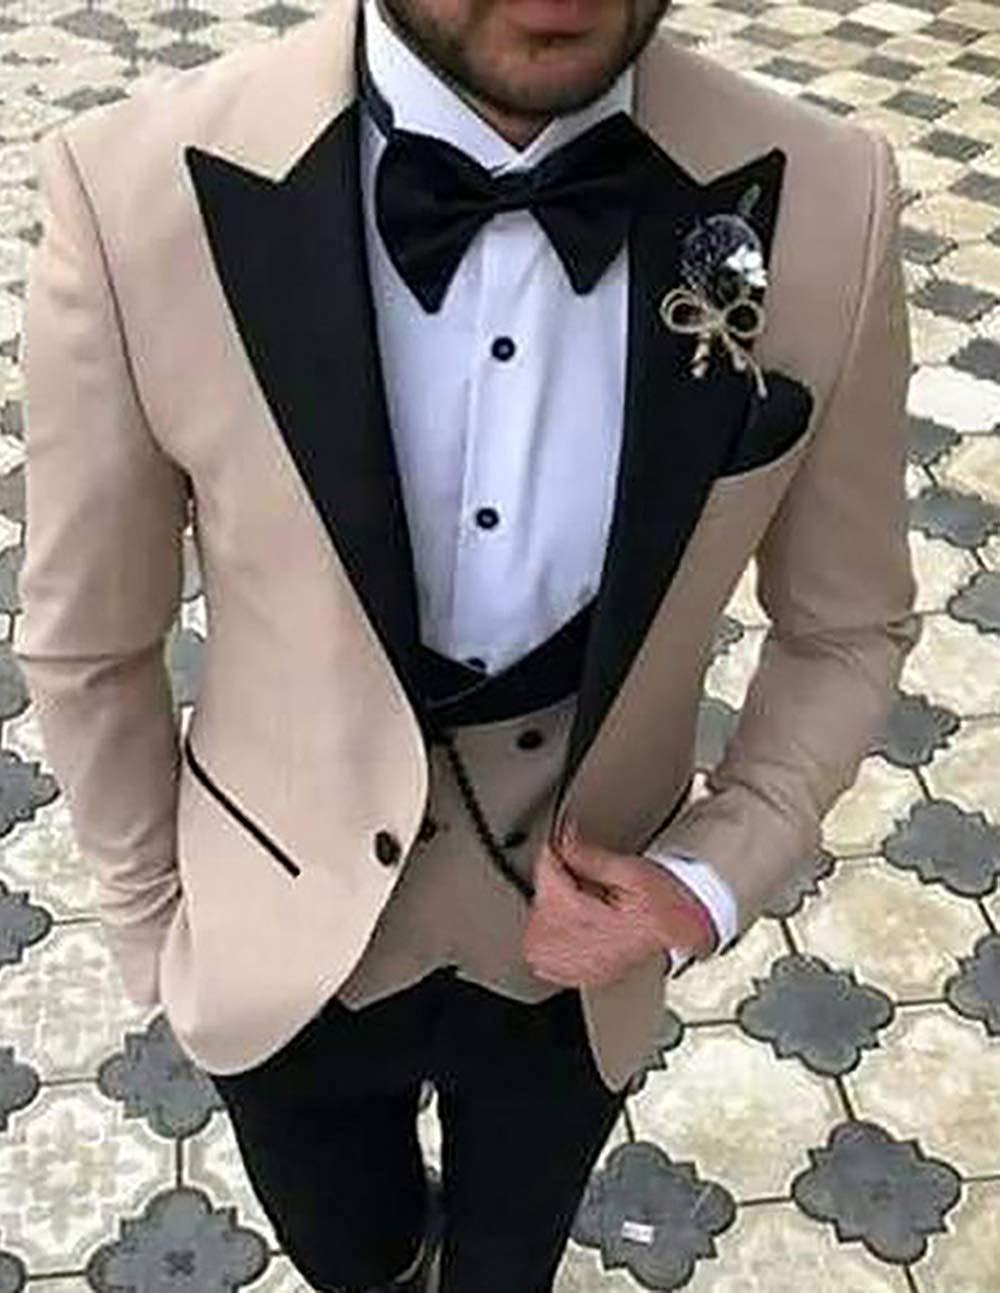 Solovedress-بدلة رسمية رجالية من 3 قطع ، ملابس رسمية رسمية للعمل ، لون عادي ، جاكيت زفاف (بليزر + صدرية + بنطلون)